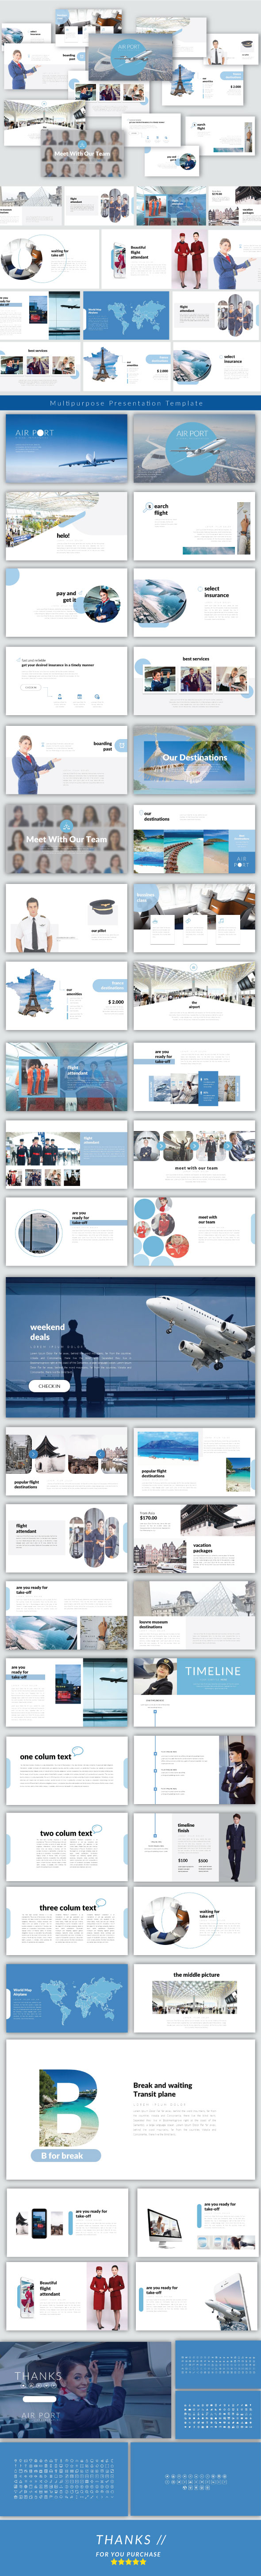 Airport - Googleslide Templates - Google Slides Presentation Templates